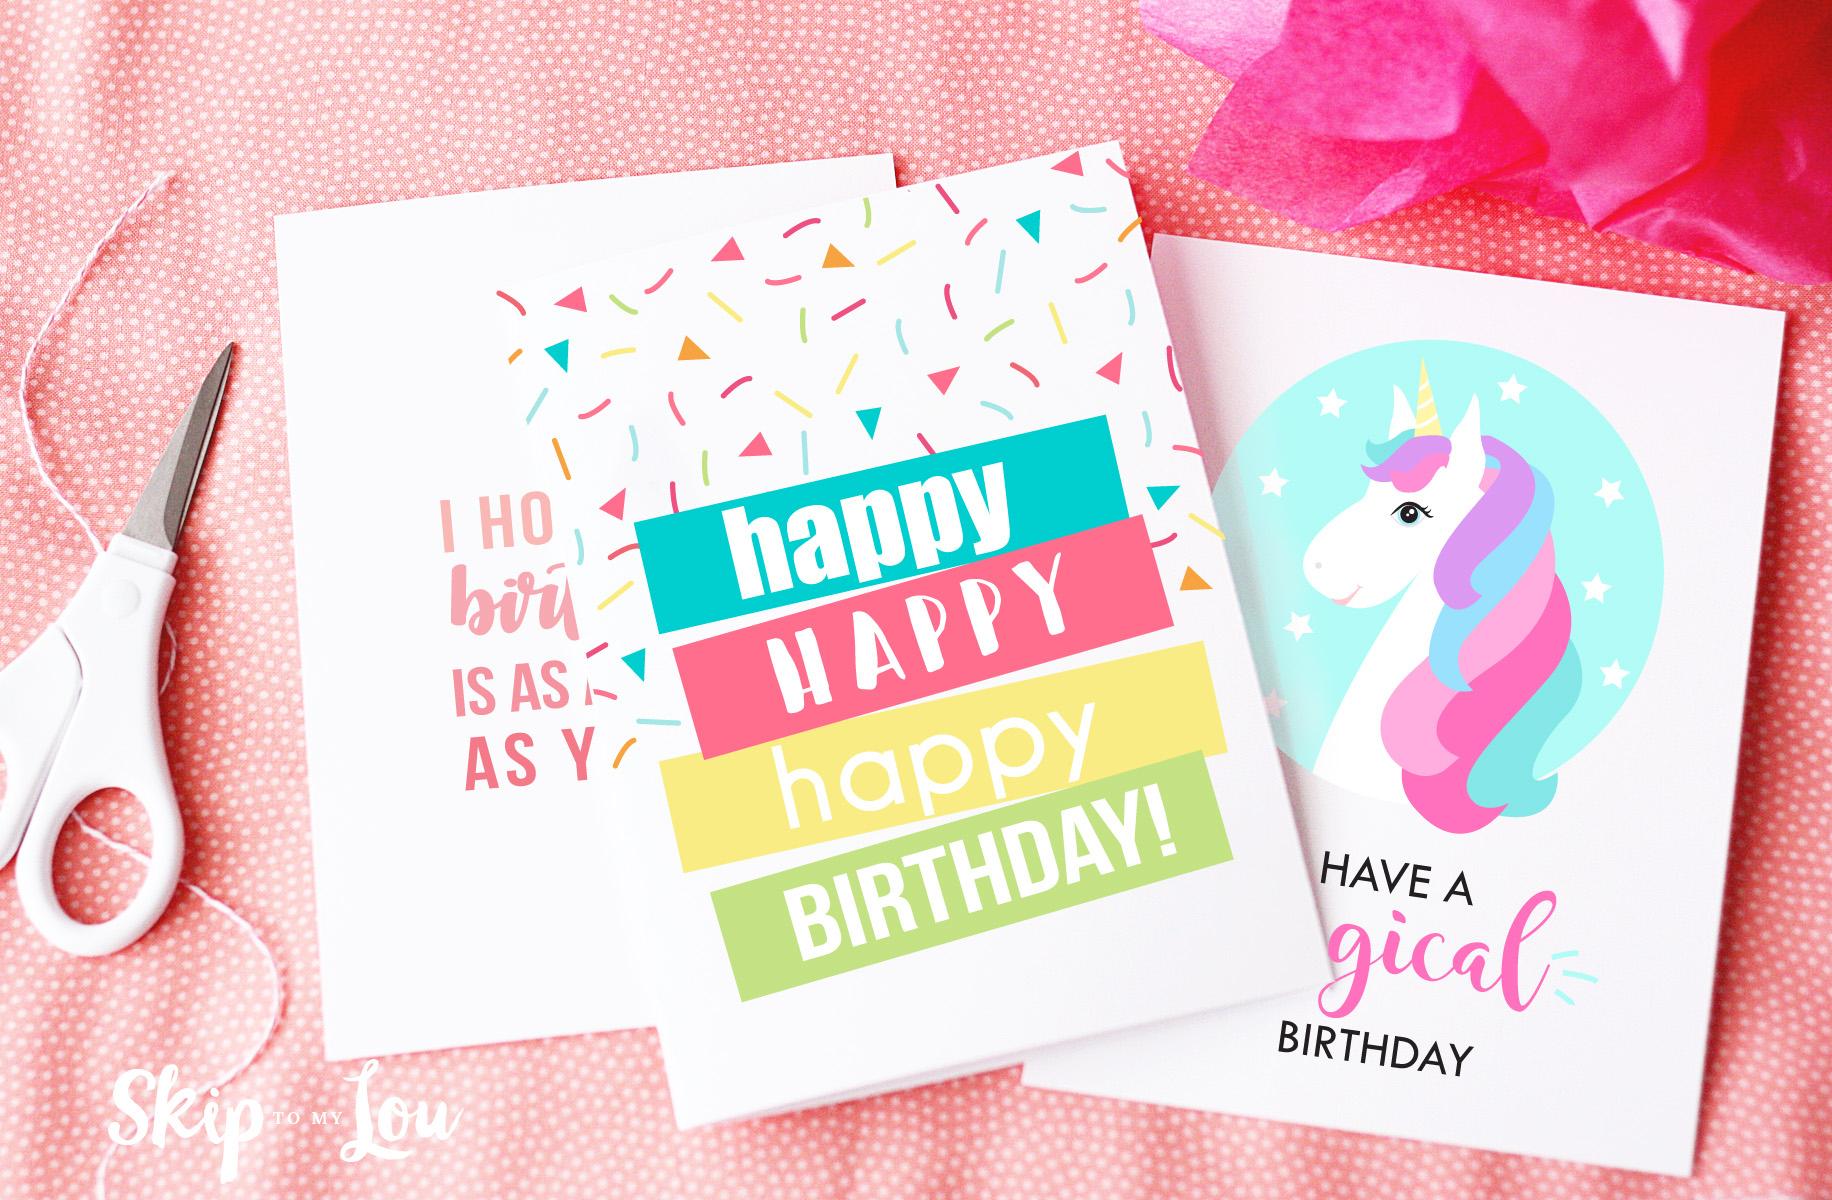 Free Printable Birthday Cards | Skip To My Lou - Free Printable Birthday Cards For Your Best Friend